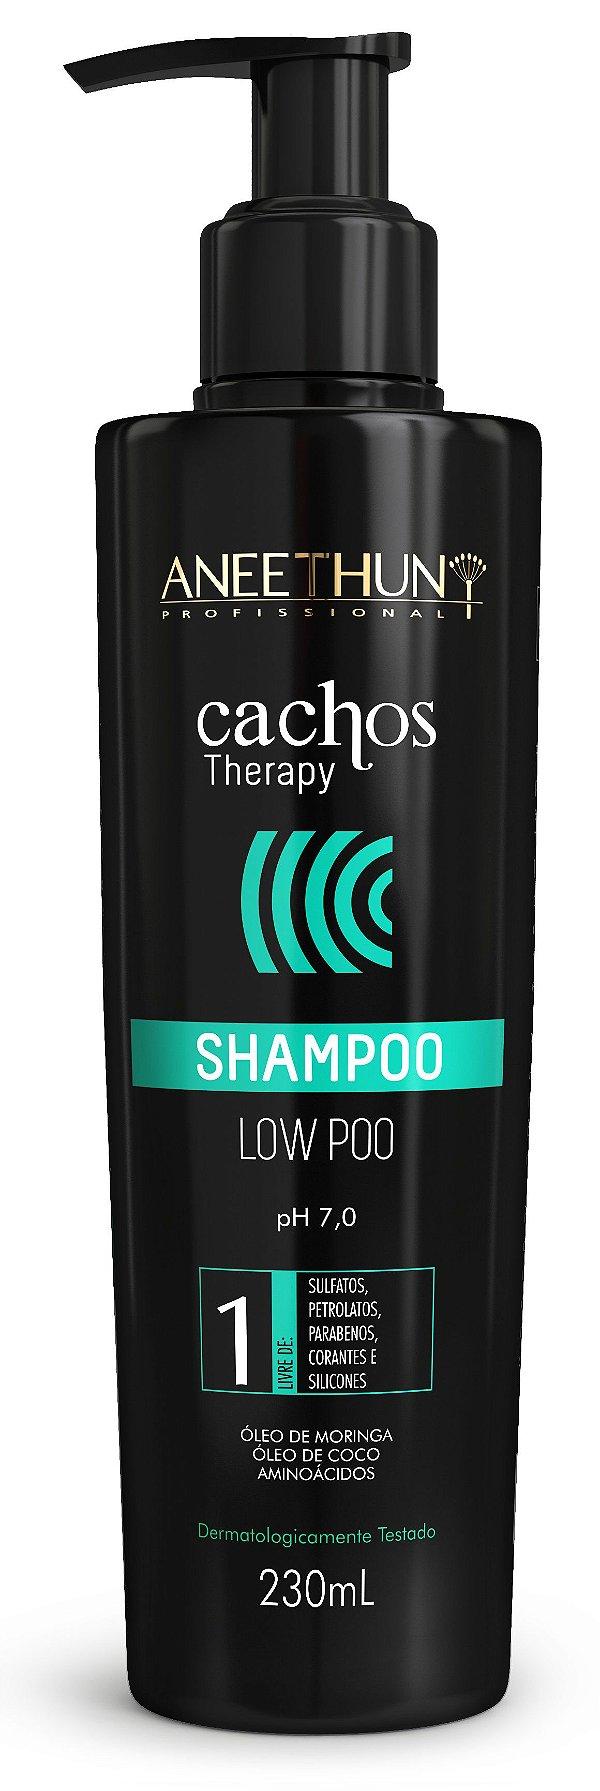 SHAMPOO LOW POO   ANEETHUN